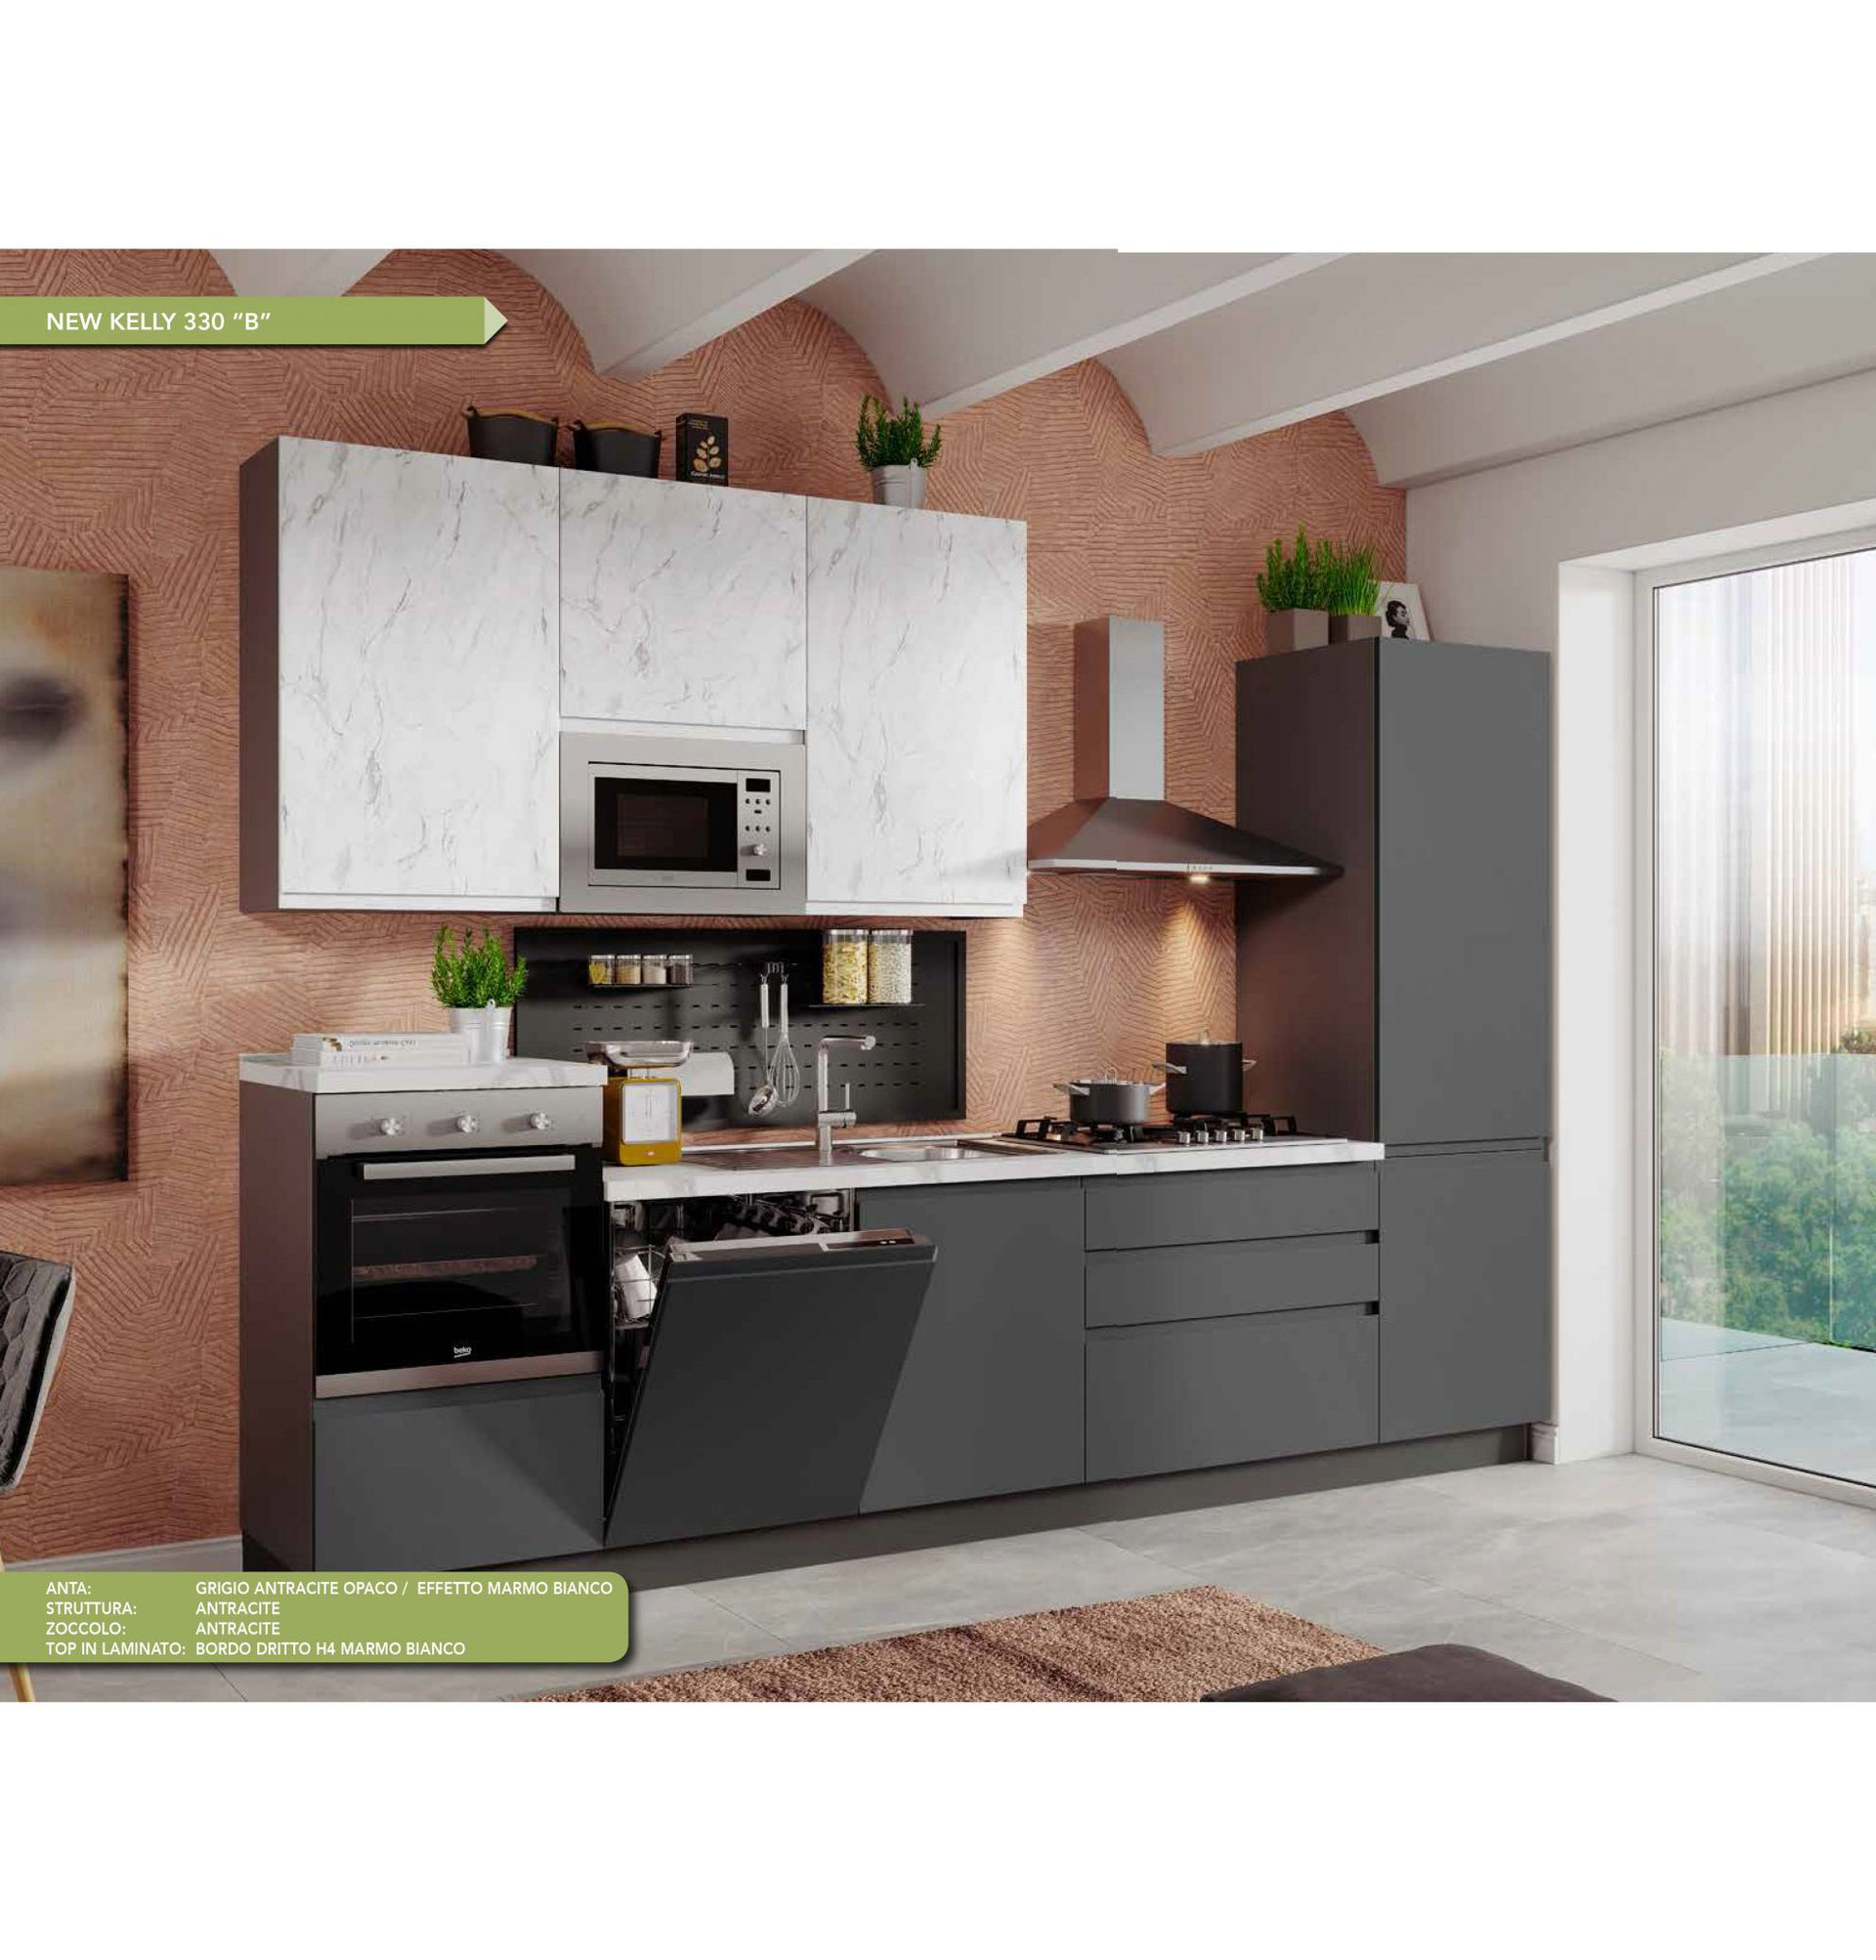 Cucina Moderna Completa Elettrodomestici.Le Cucine Componibili Moderne Benvenuti Su Outletarredamentipietrobonfa